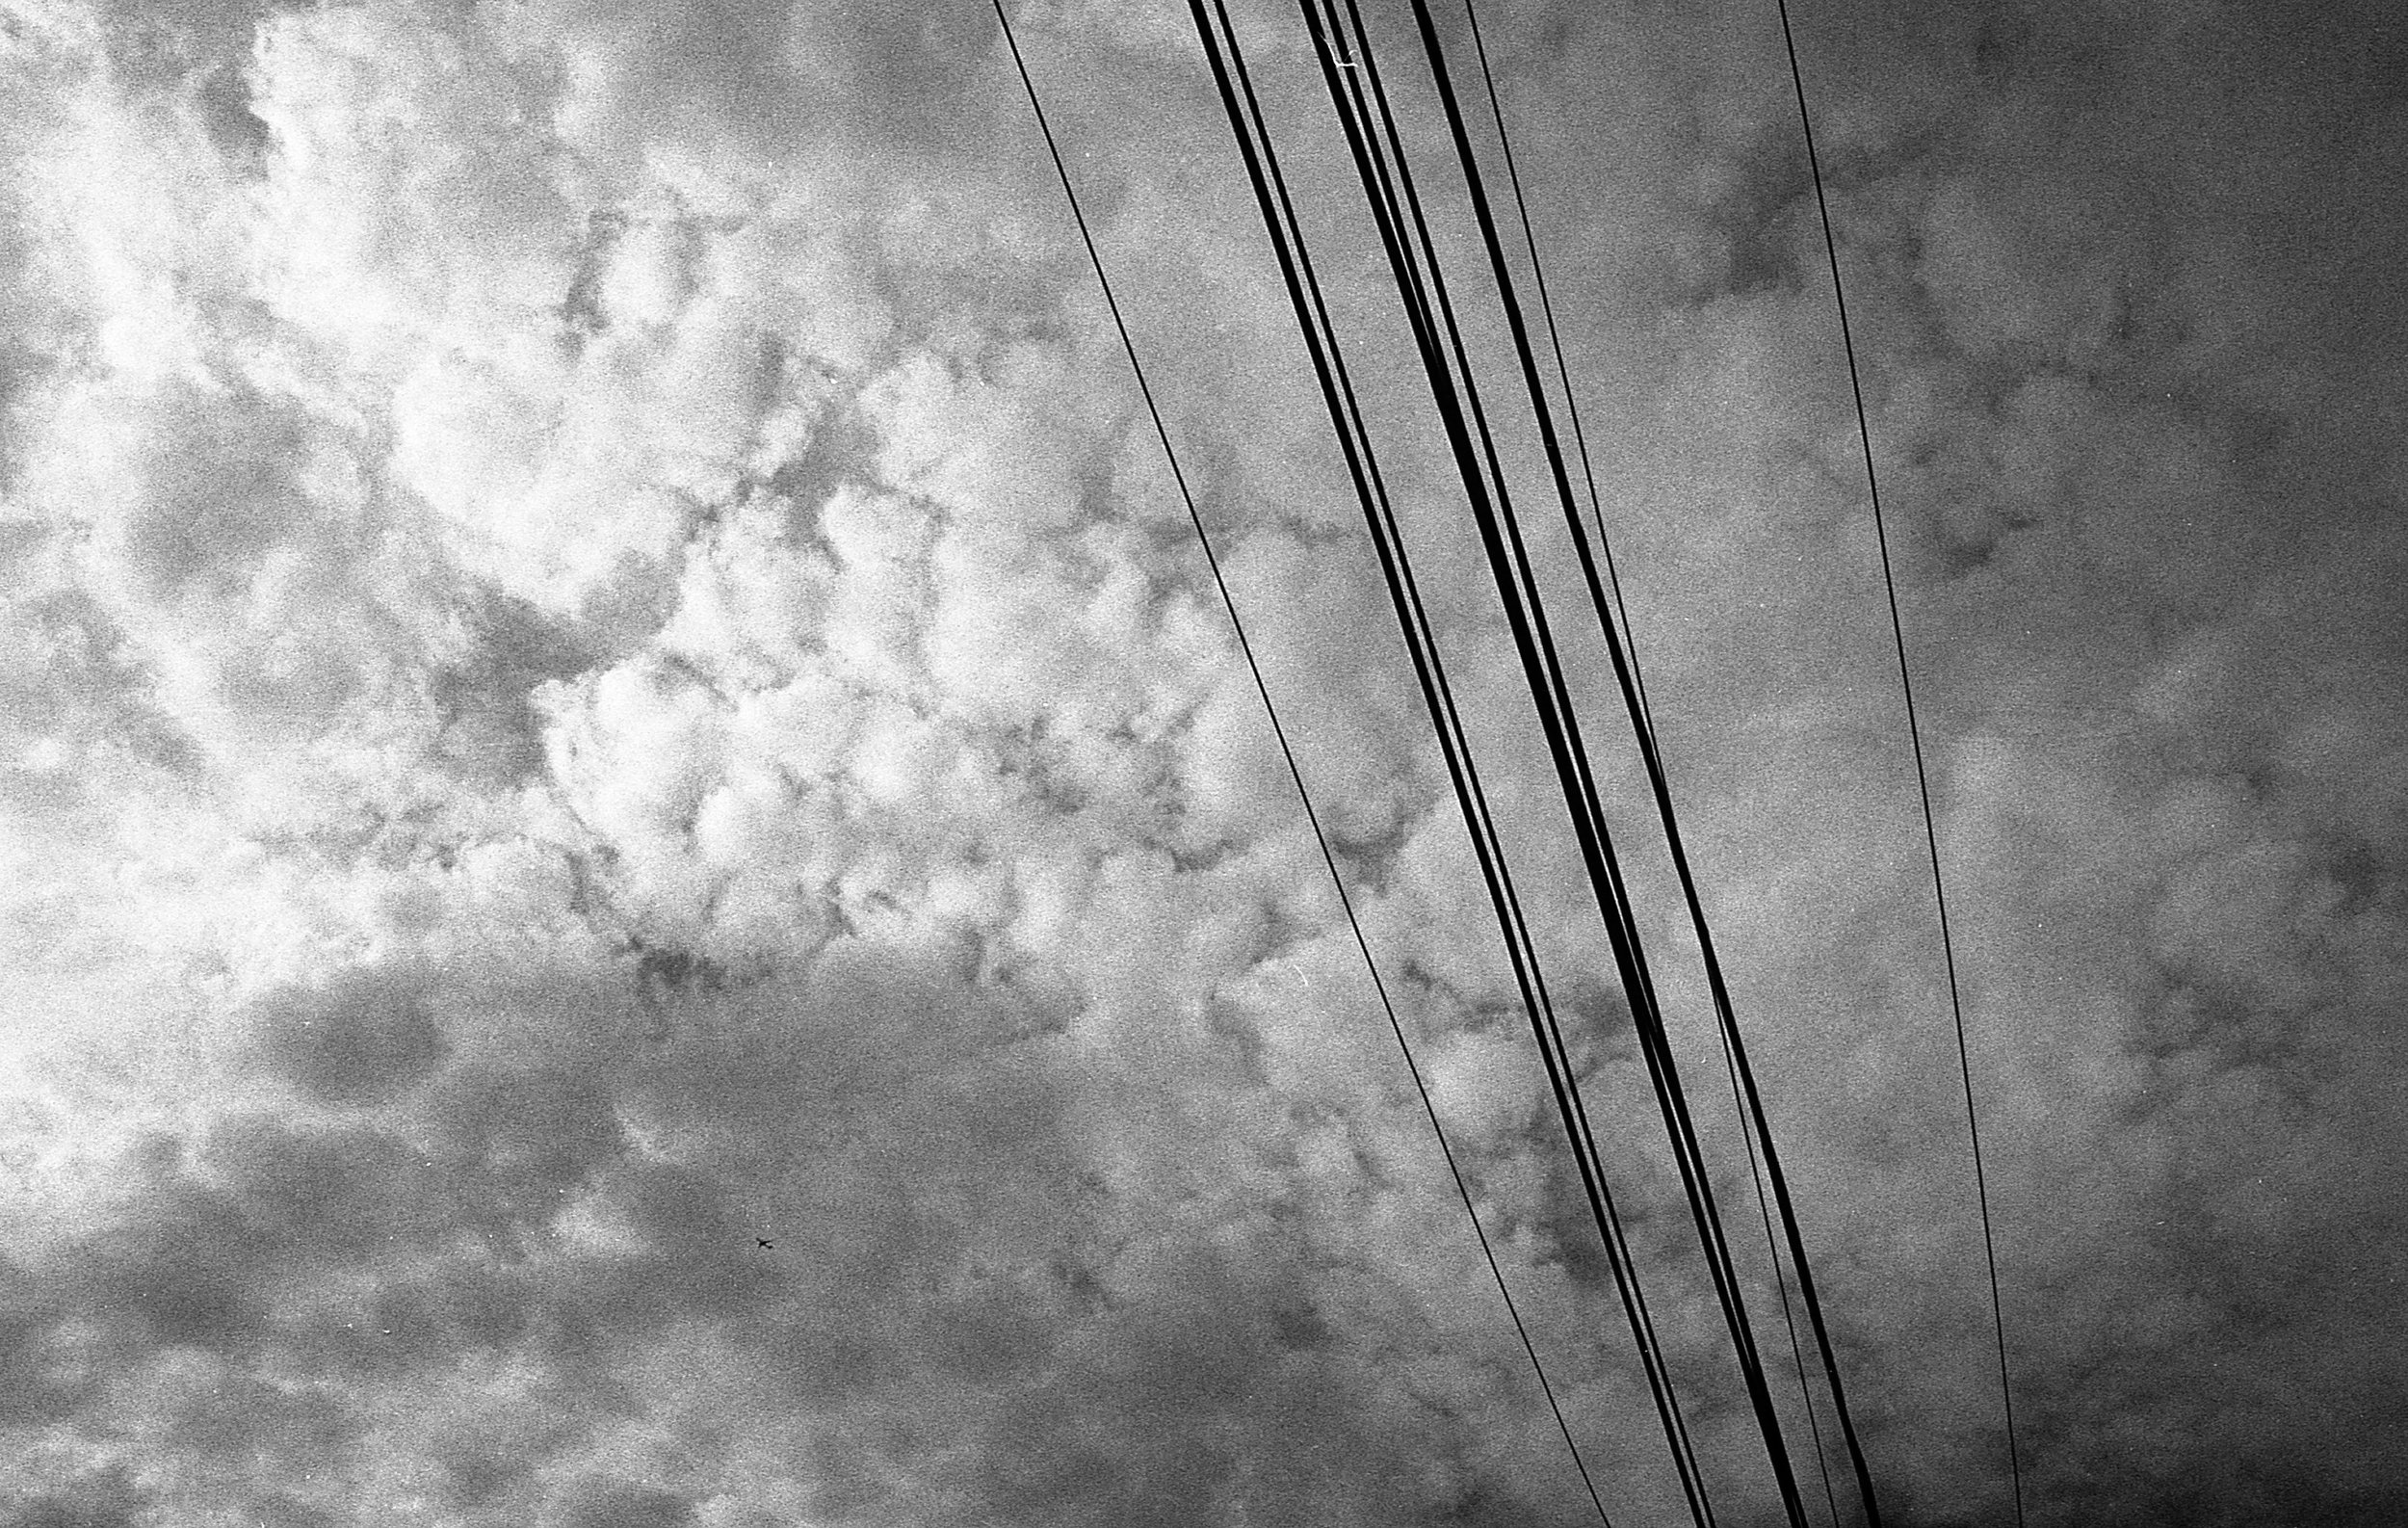 1981 Minolta X-700 Photo 35mm Film Zoe Kissel Sky Cloud Filter